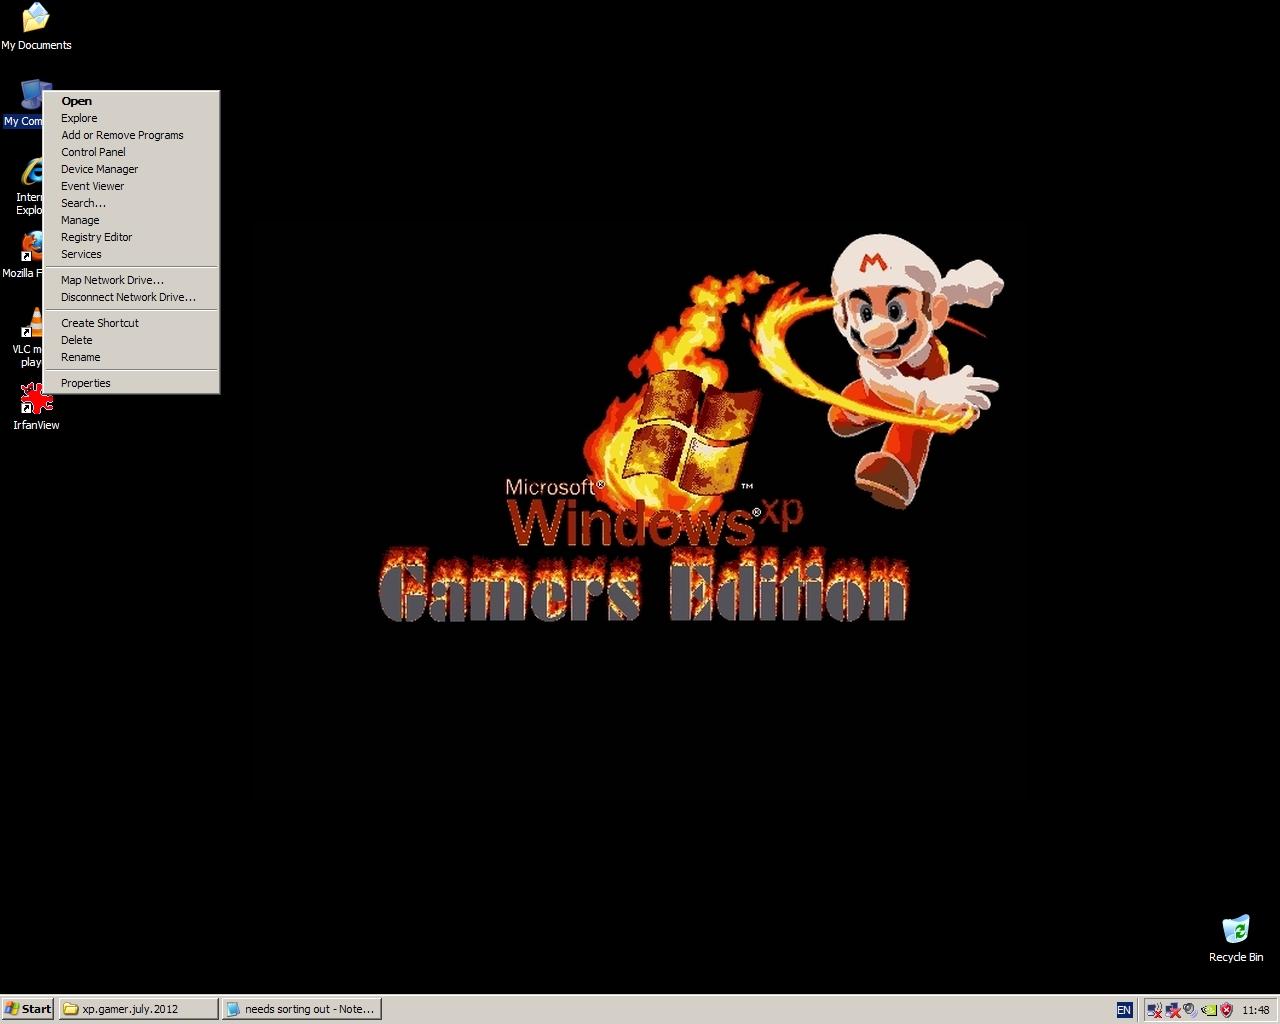 Ventrilo server 3.0.3 cracked by deeznuts 999 user